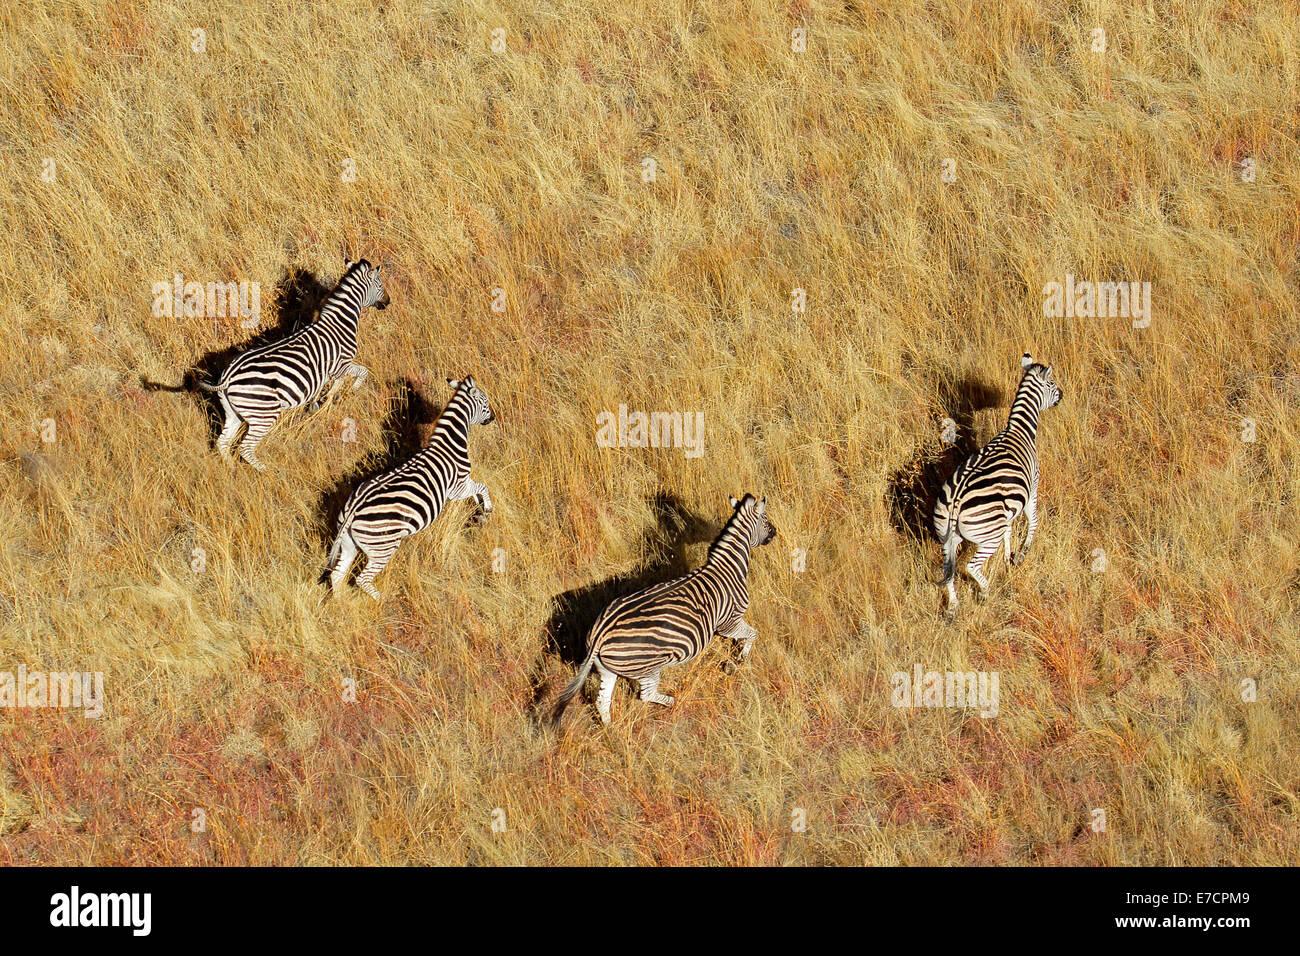 Aerial view of Plains (Burchells) Zebras (Equus burchelli) in grassland, South Africa - Stock Image